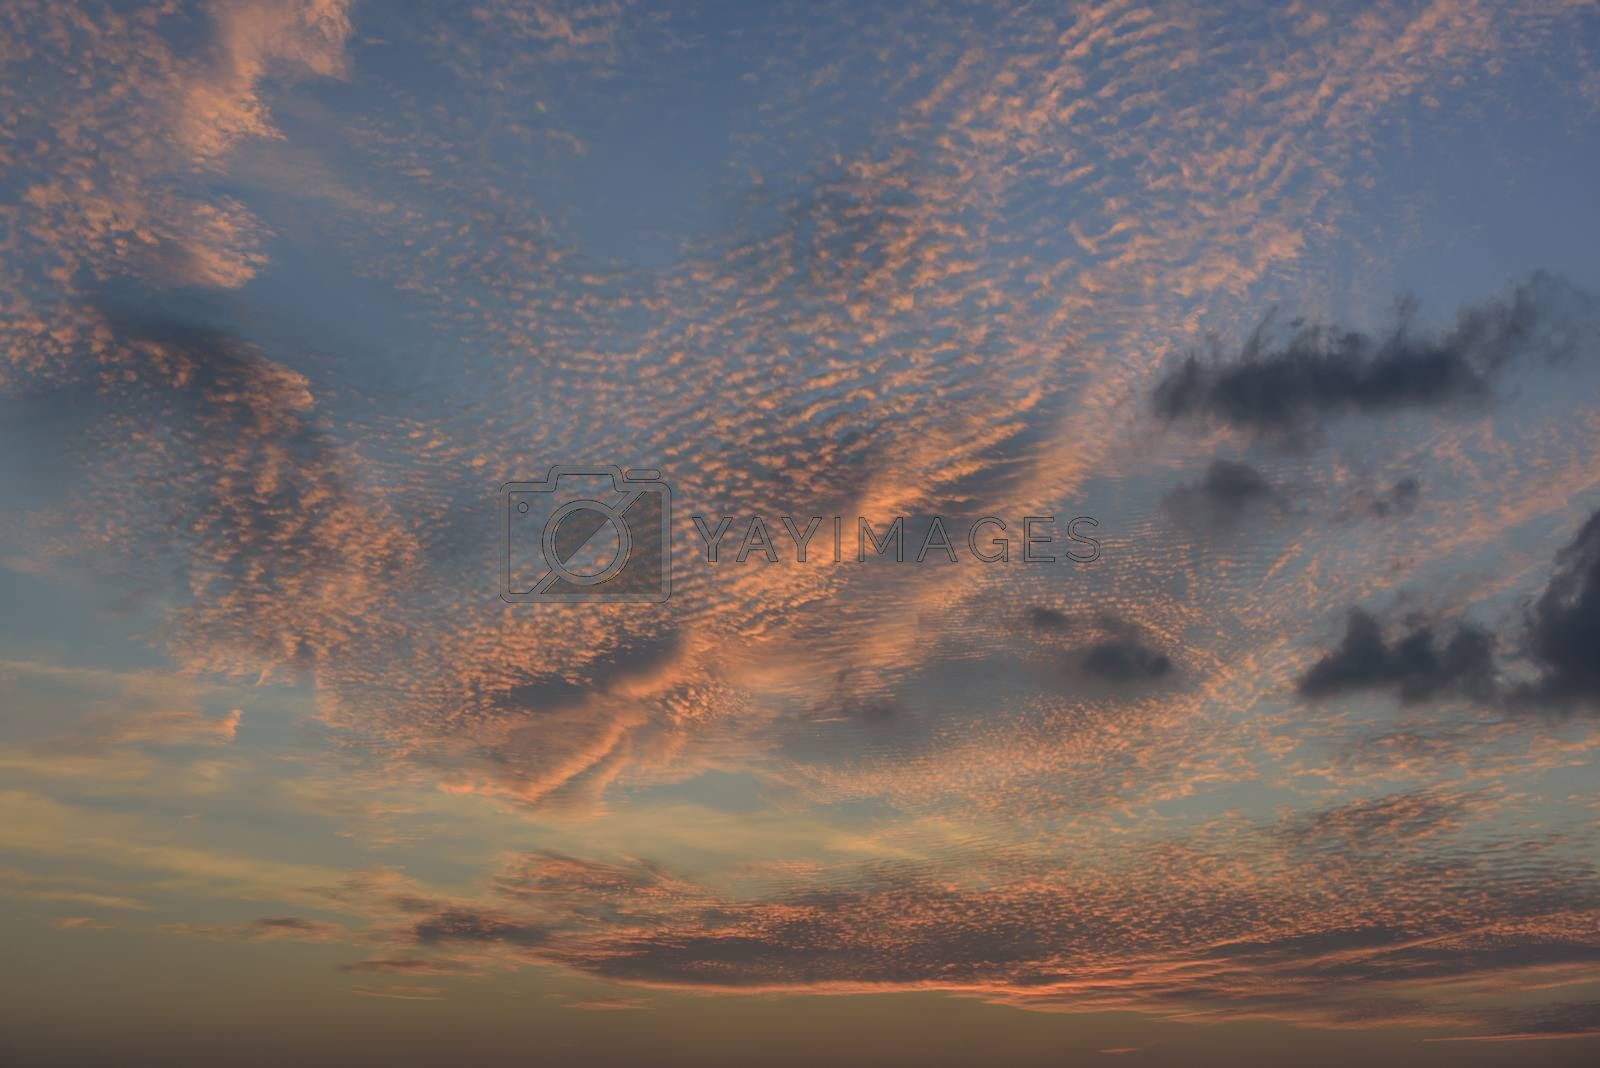 Blue sky and orange cloud back ground at twilight